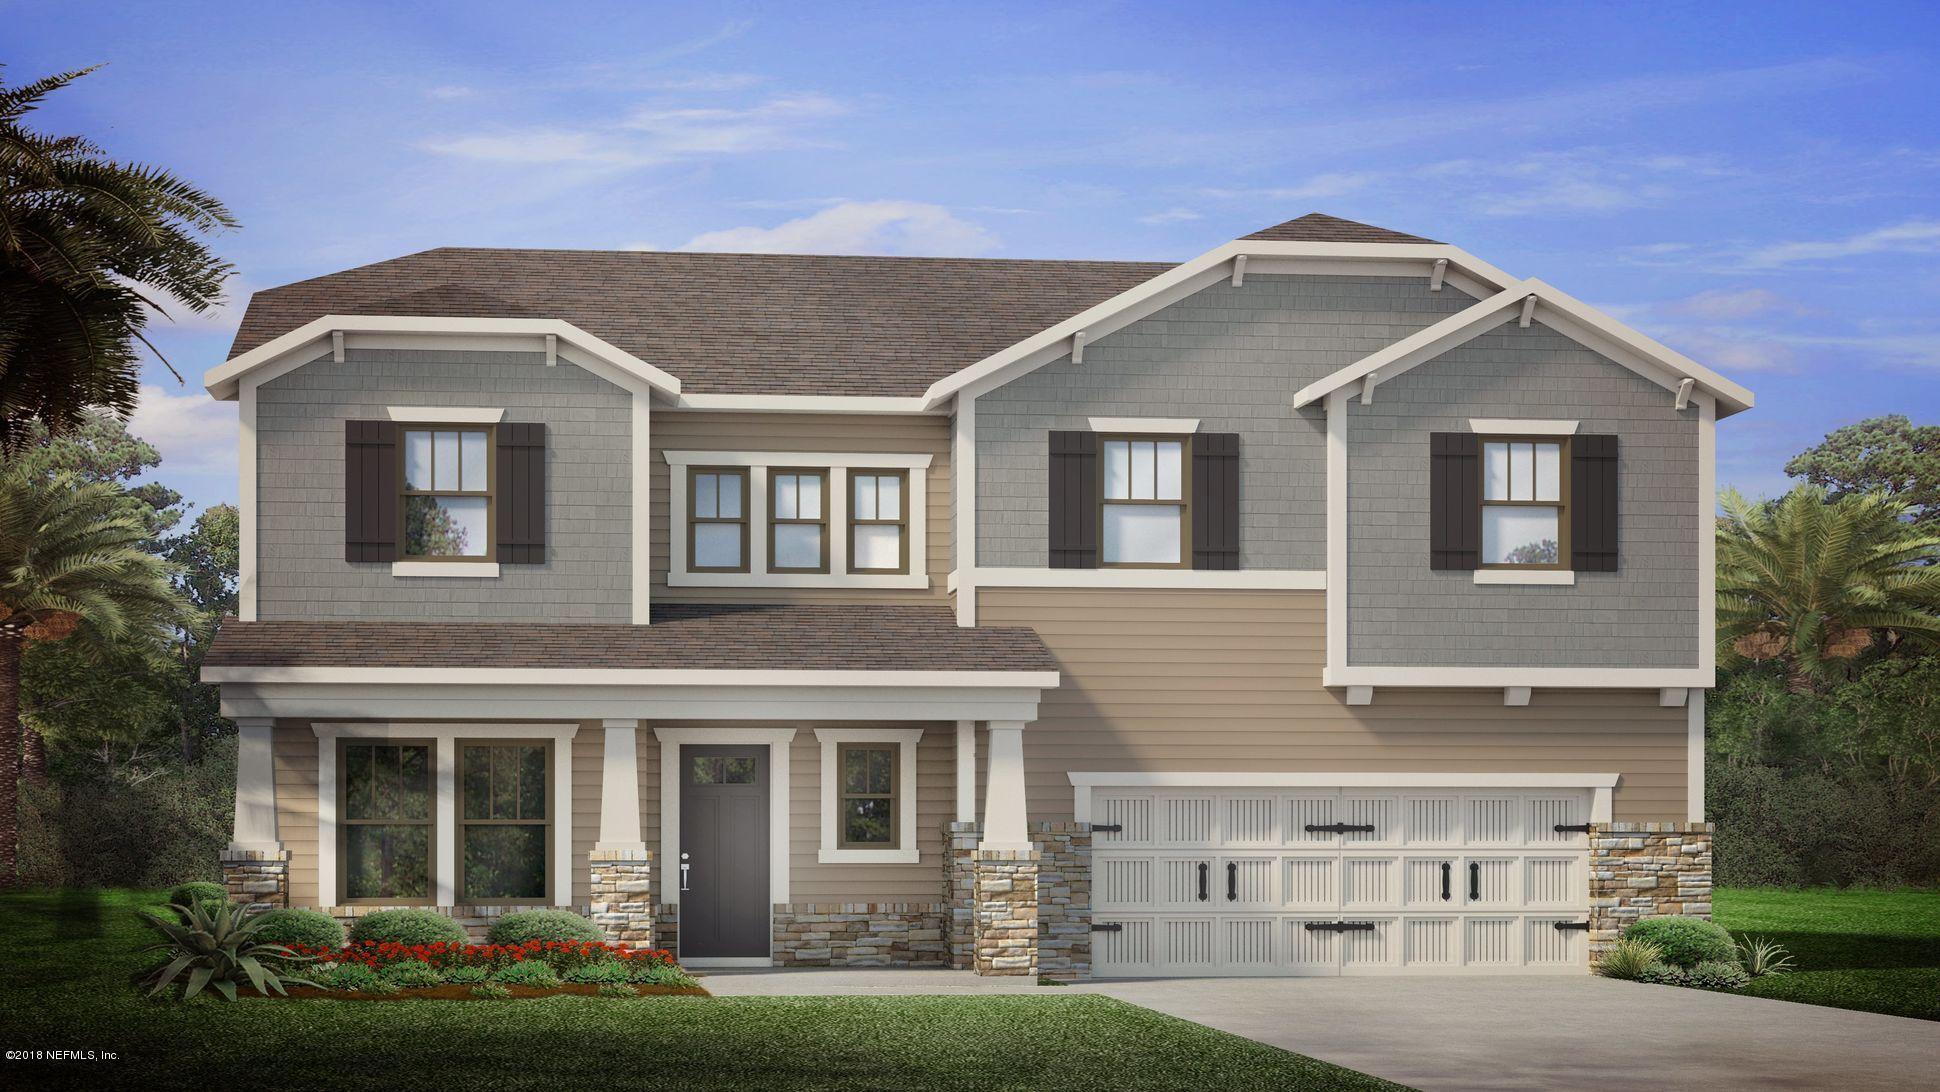 242 VILLAGE, PONTE VEDRA, FLORIDA 32081, 4 Bedrooms Bedrooms, ,2 BathroomsBathrooms,Residential - single family,For sale,VILLAGE,940911